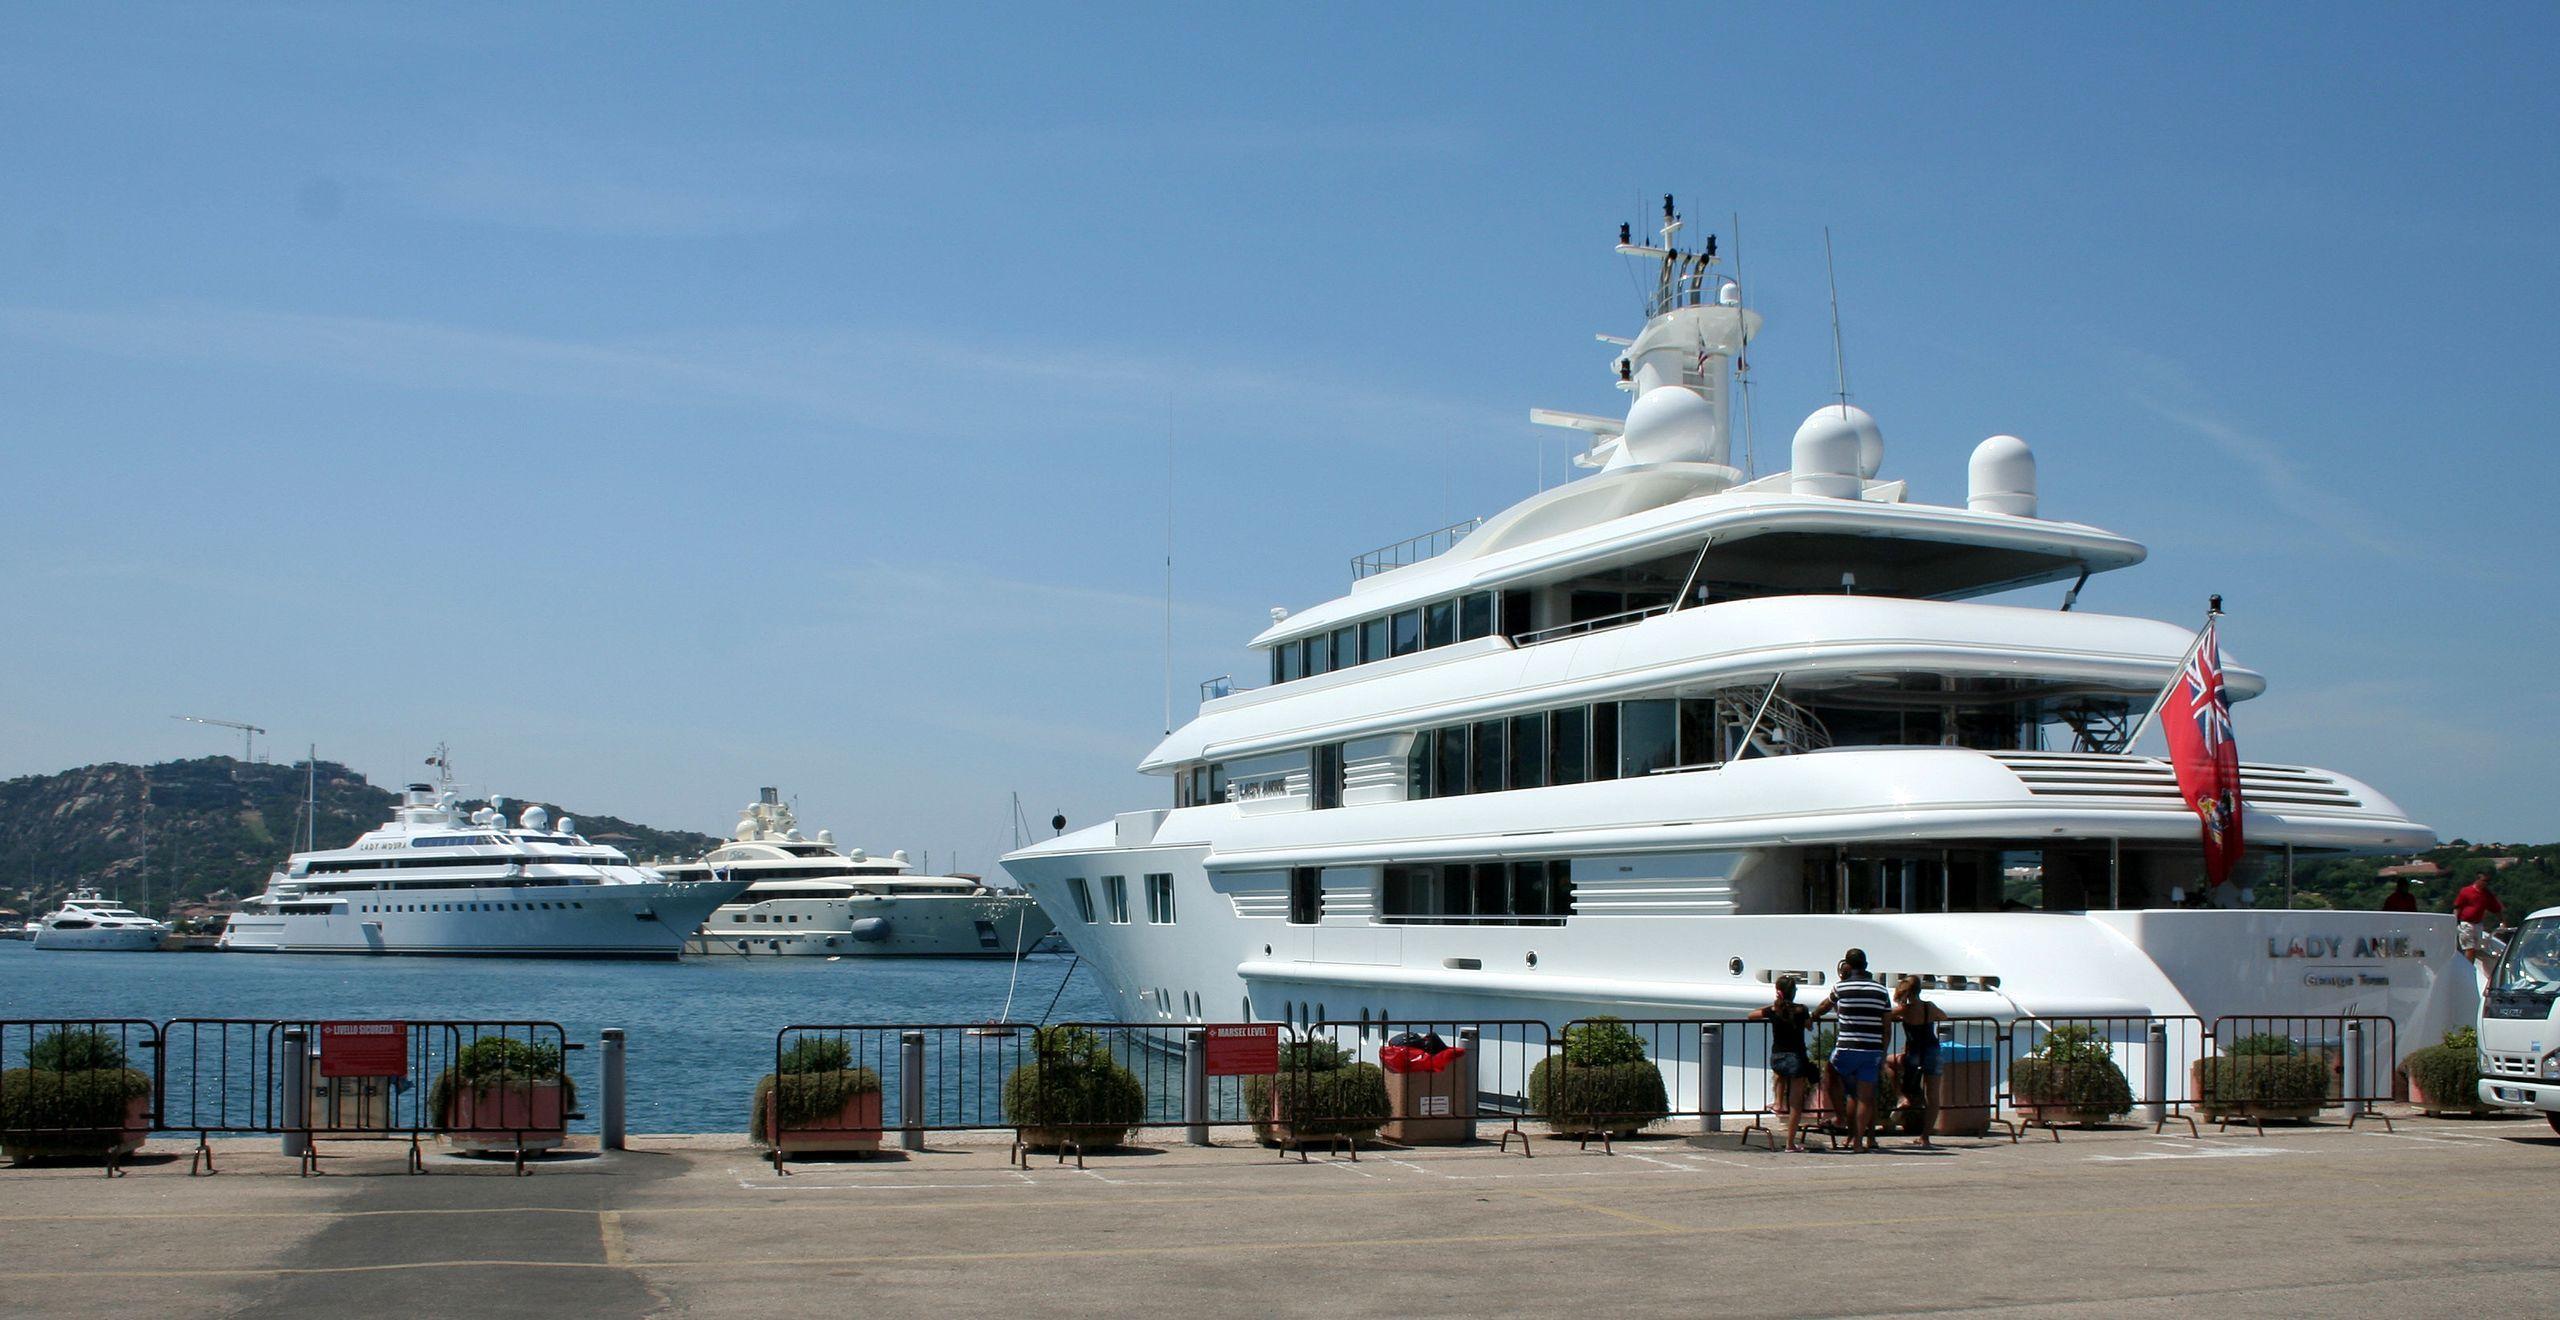 Super Yachts anchored at Porto Cervo port, Costa Smeralda